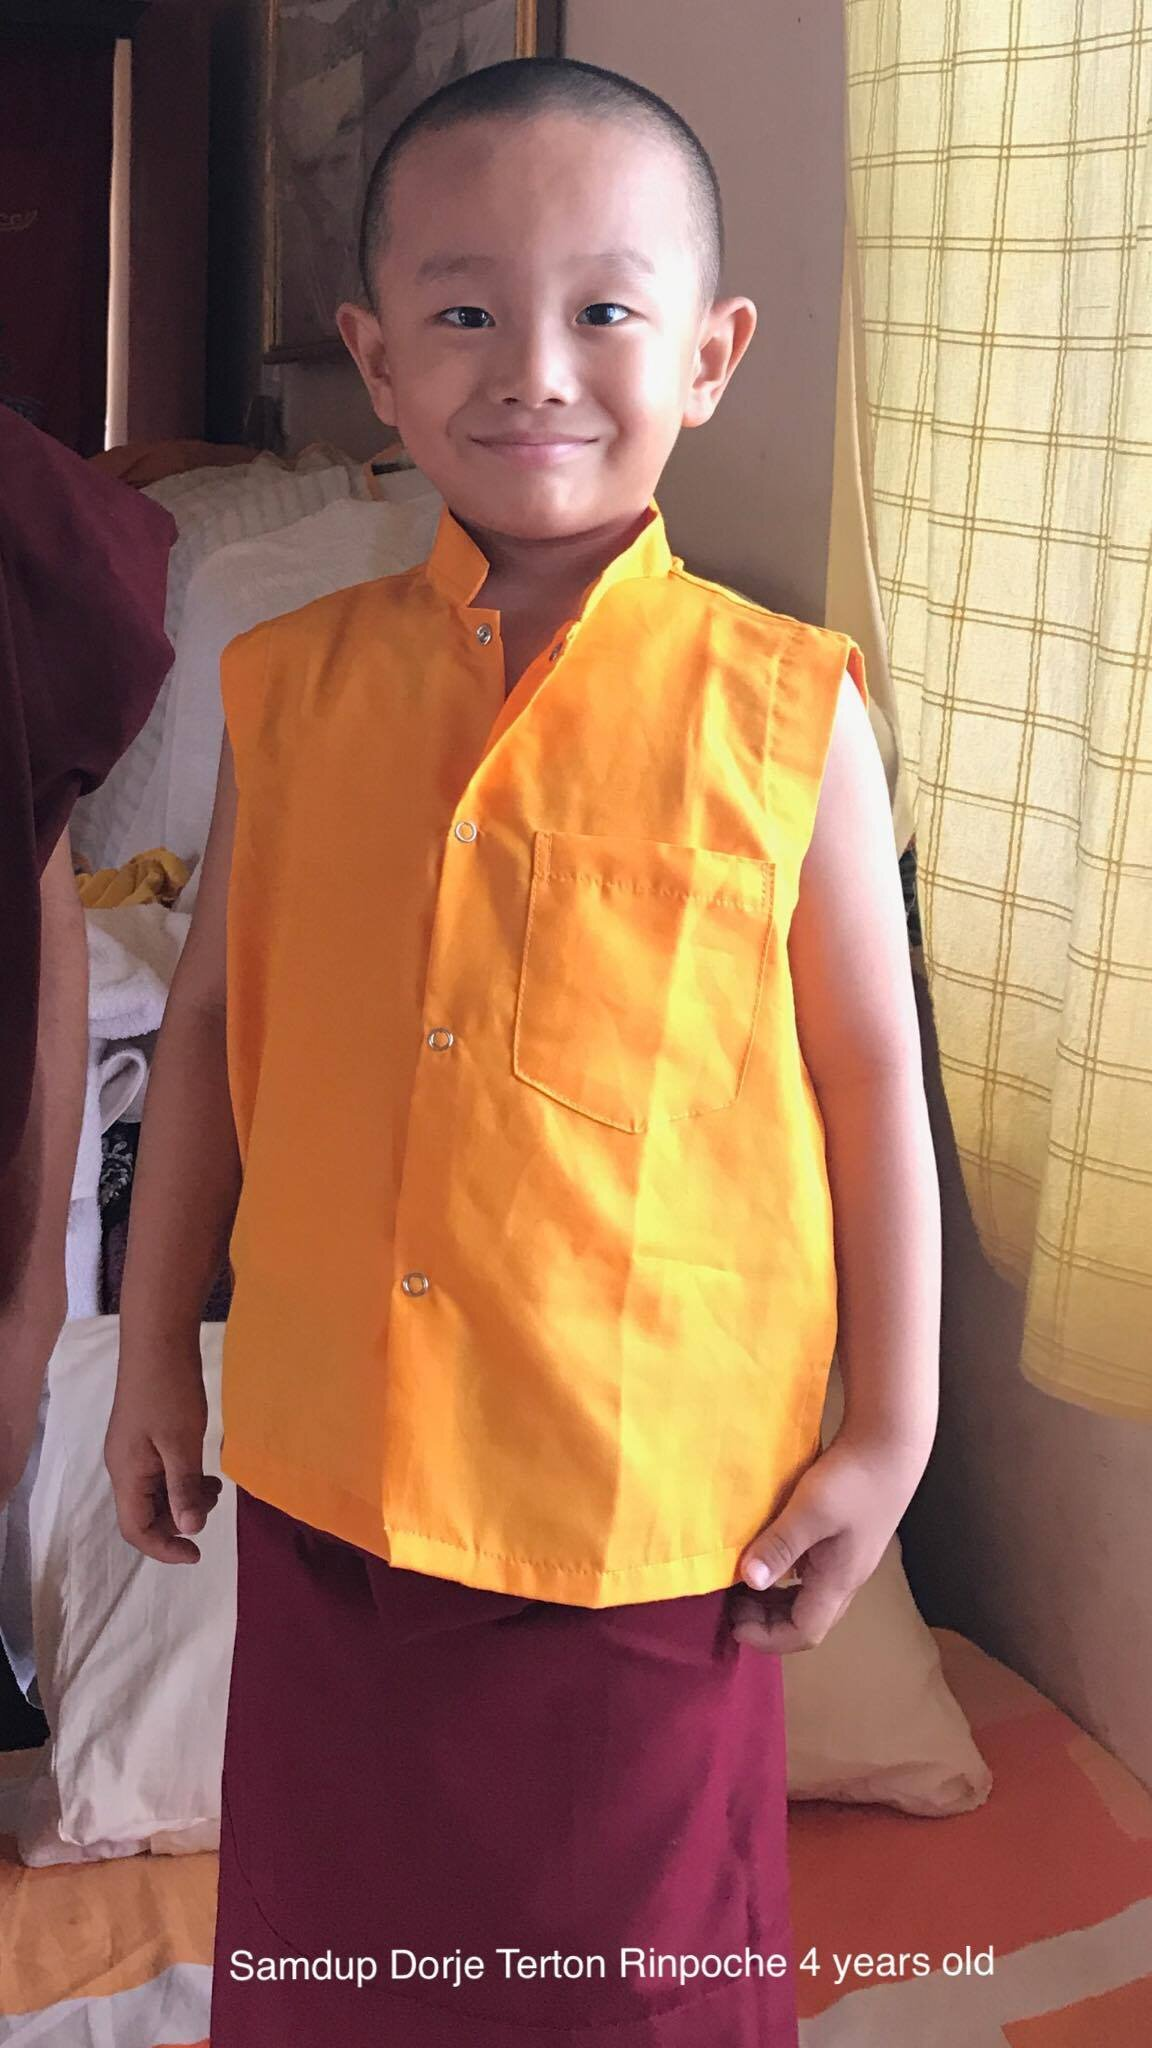 Monk_Samdup_Dorje_Terton_Rinpoche_4yrs_old.jpg